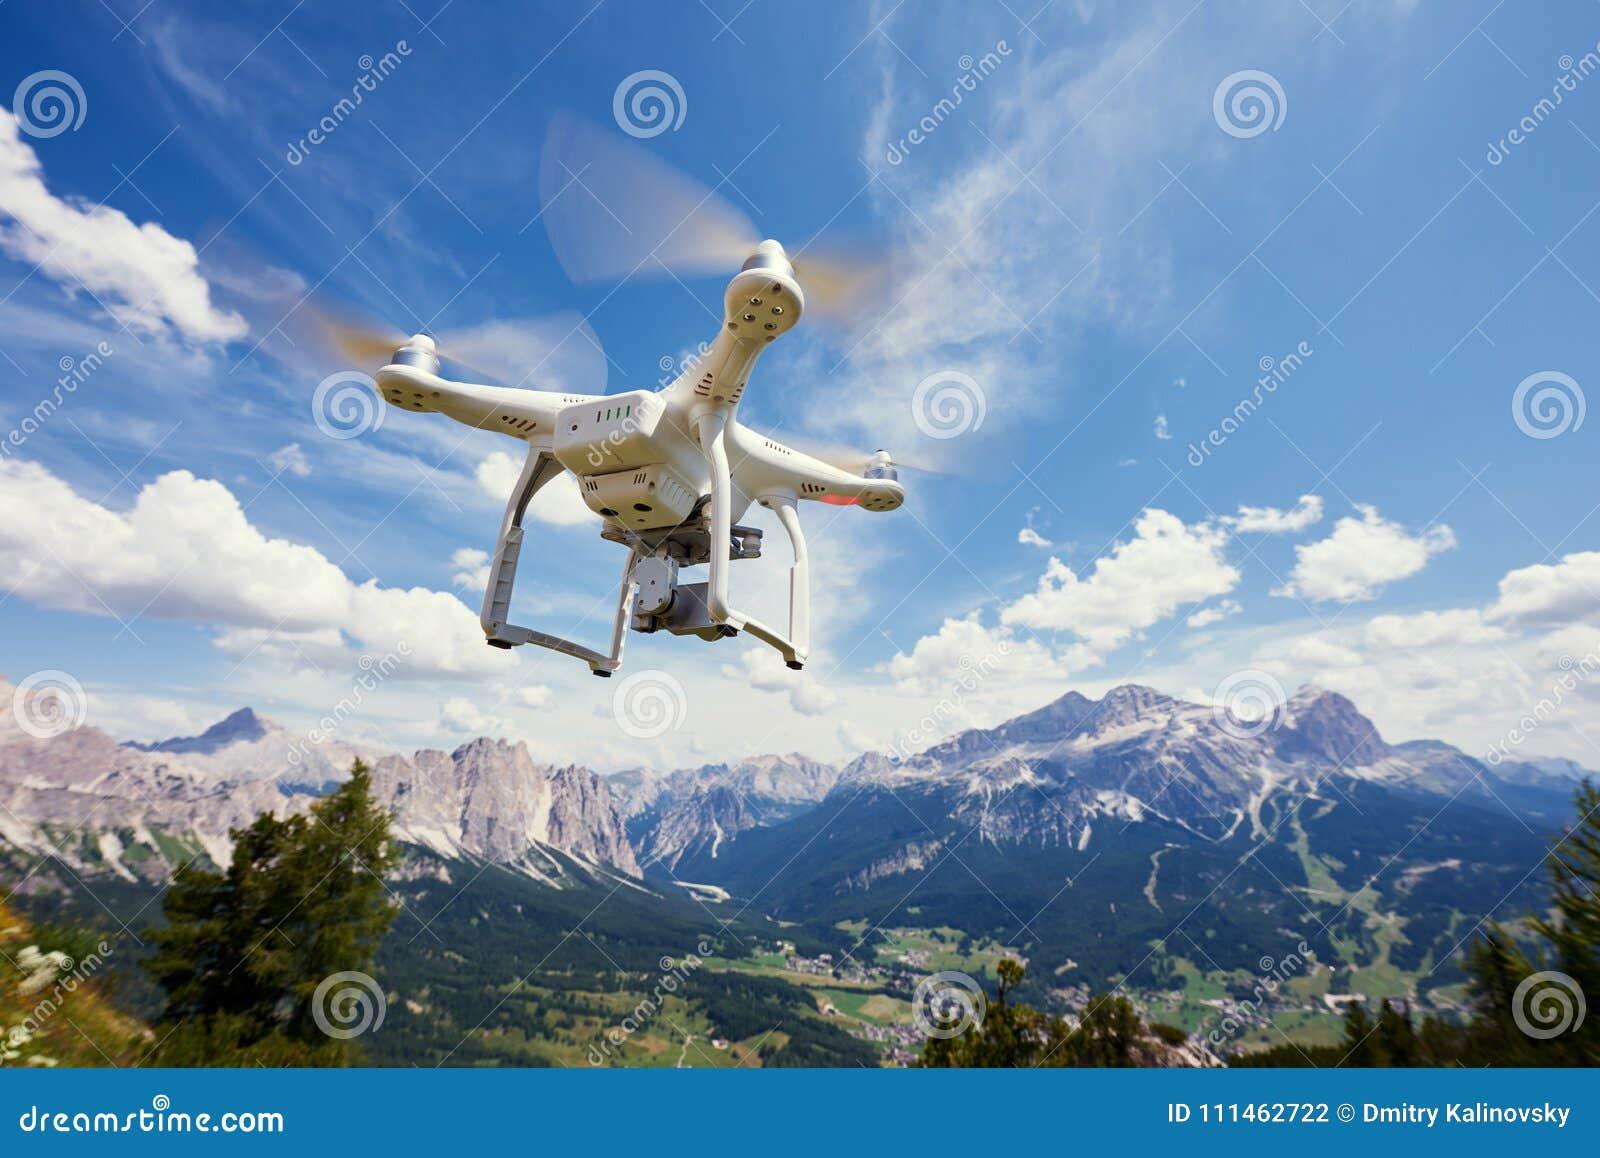 Drone quadrocopter with digital camera